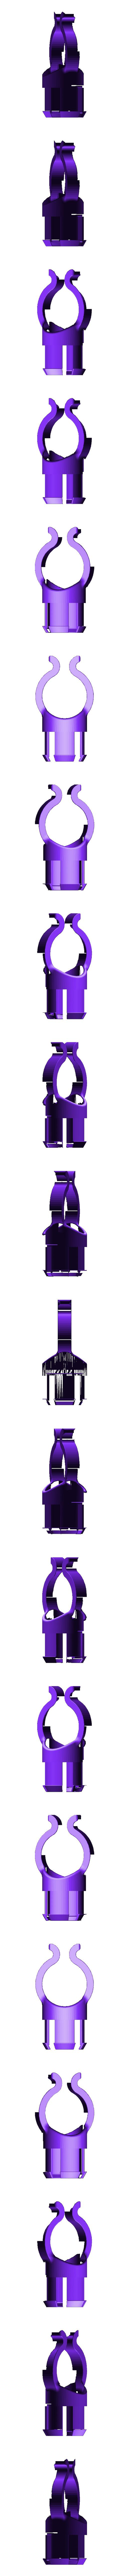 Fixation2.stl Download free STL file Stars • 3D print design, omni-moulage